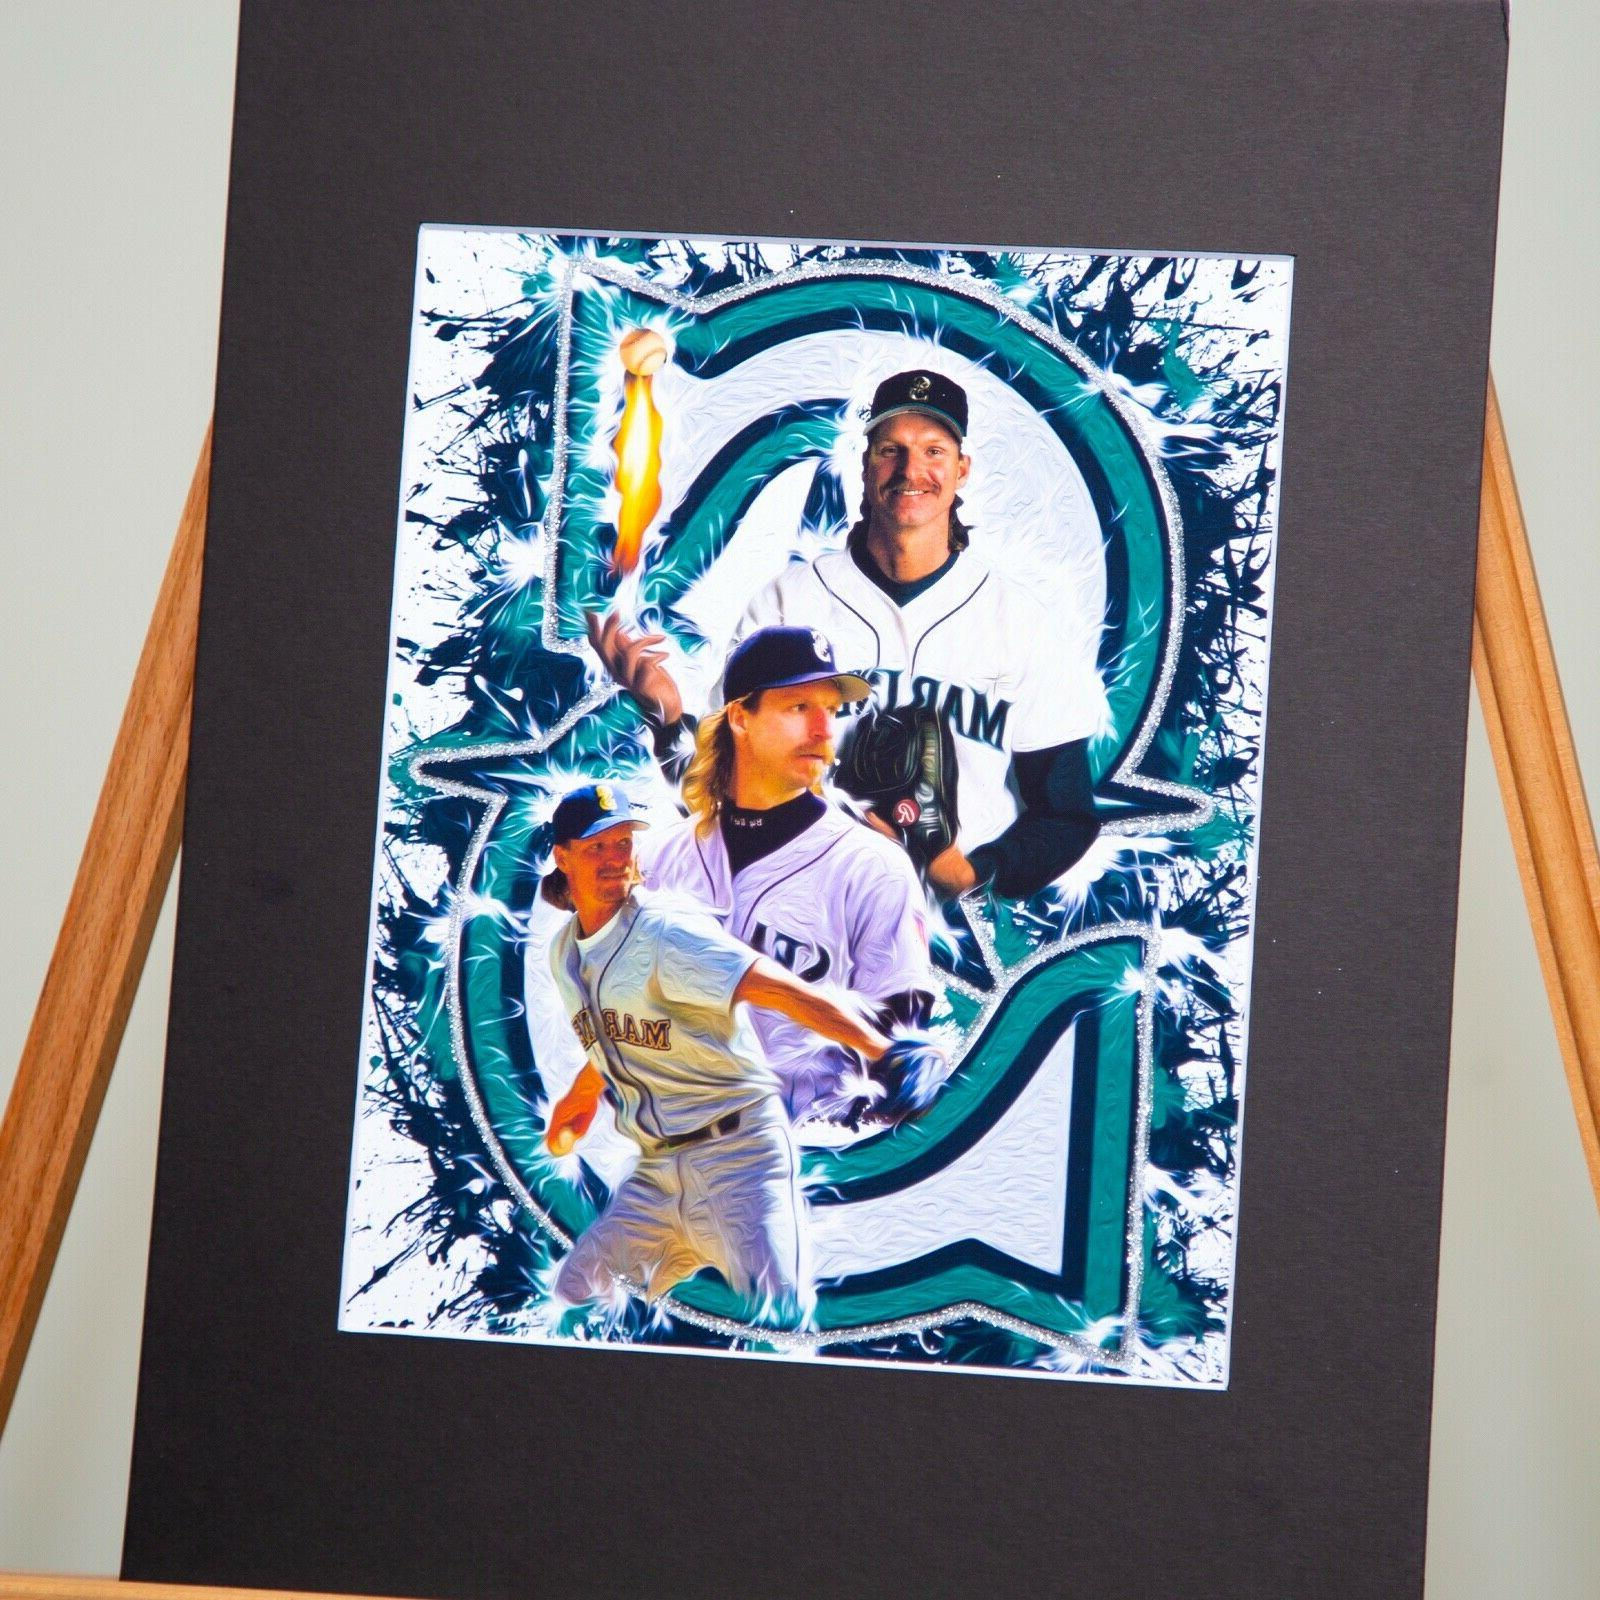 Seattle - Randy Johnson #51 The Big Artwork